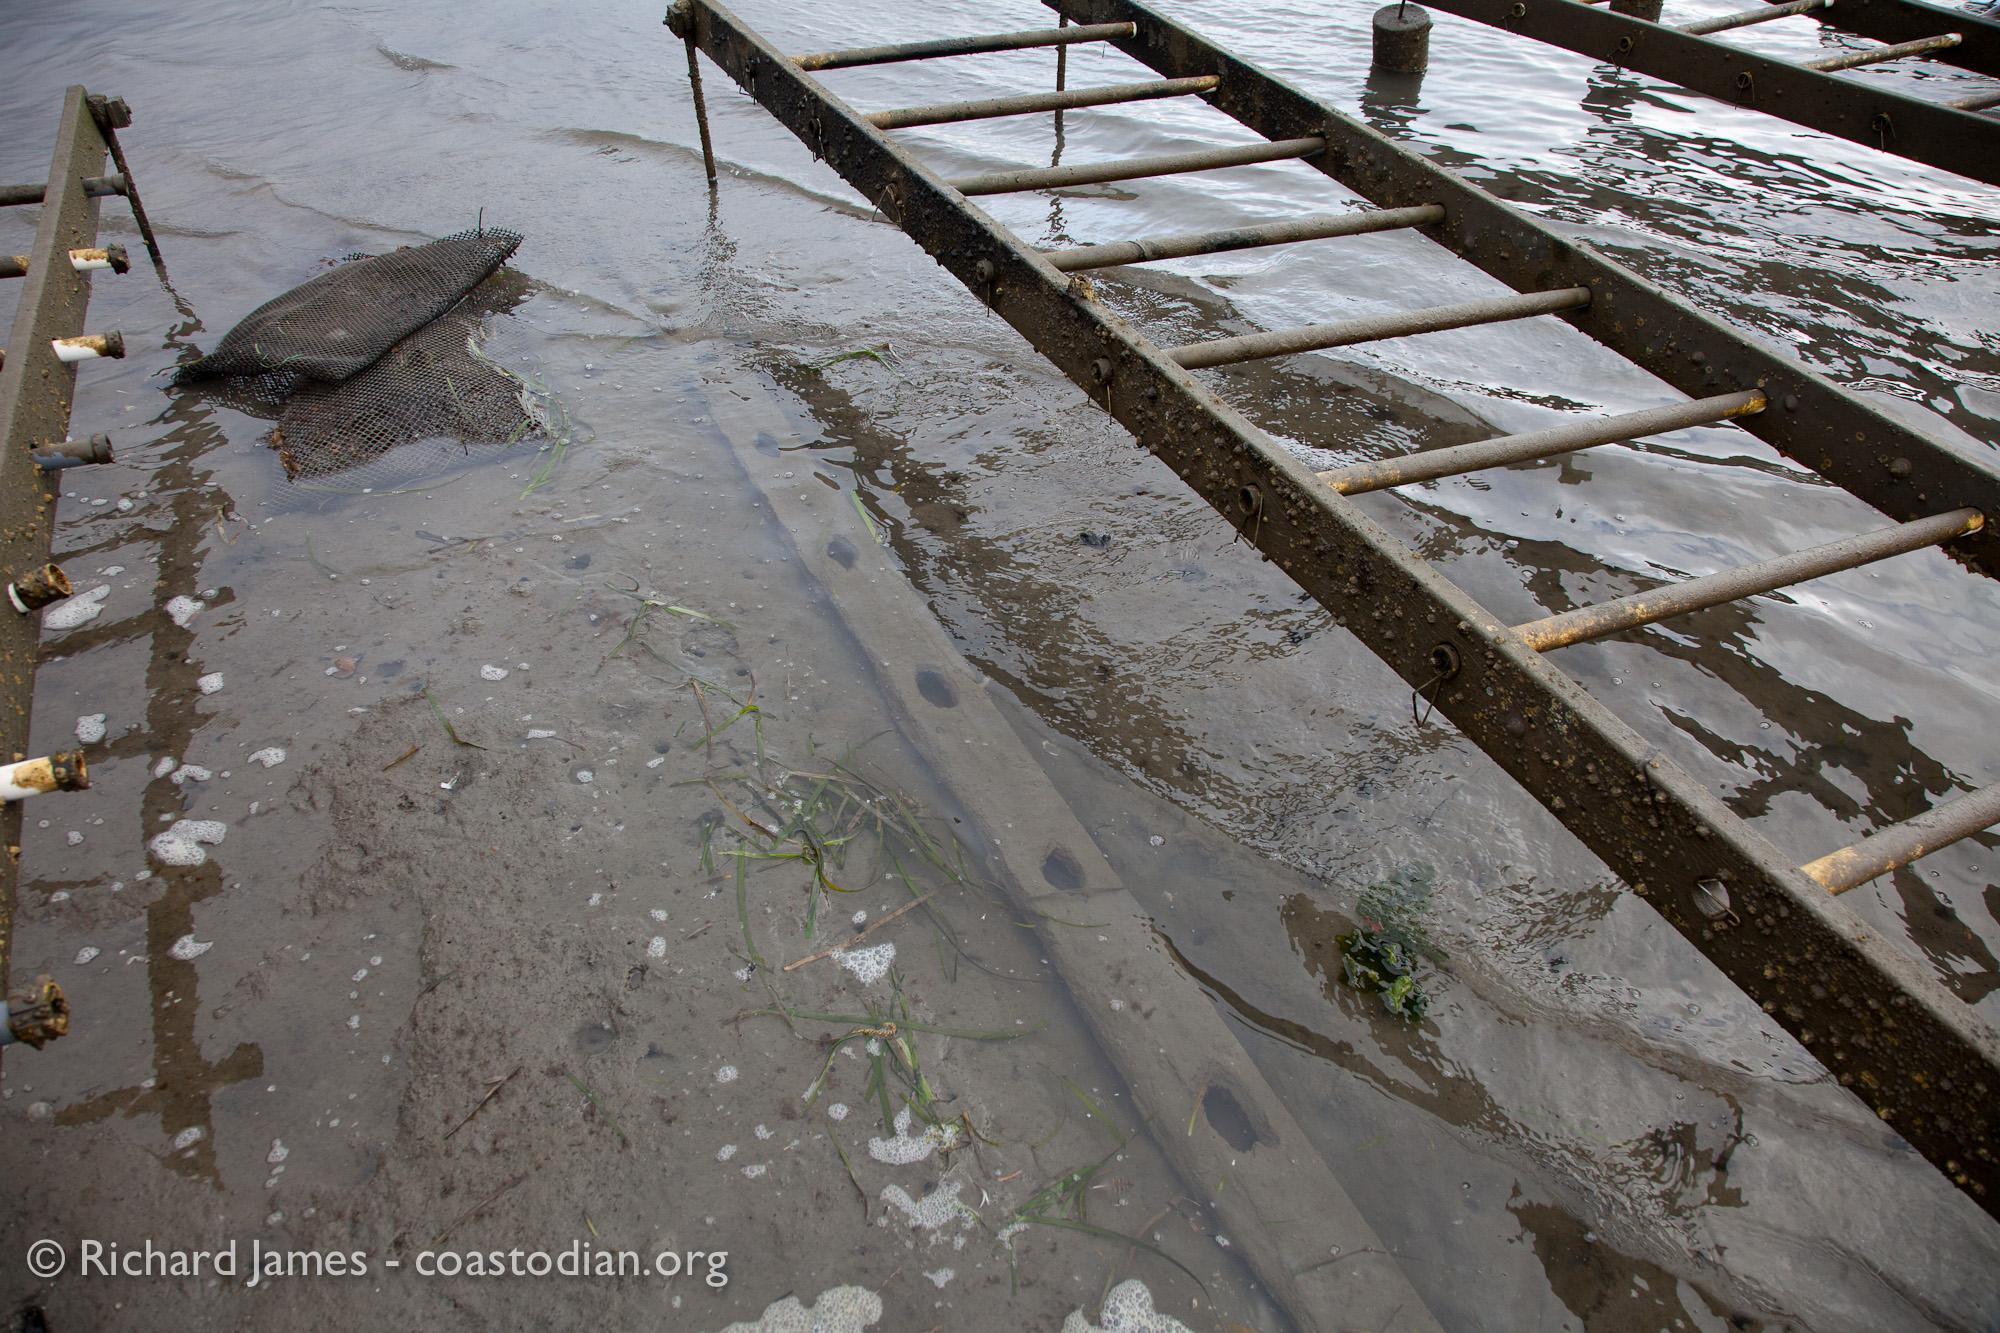 ©Richard James - coastodian.org Abandoned oyster rack lumber on Hog Island Oysters lease M-430-10 on 22 March, 2015